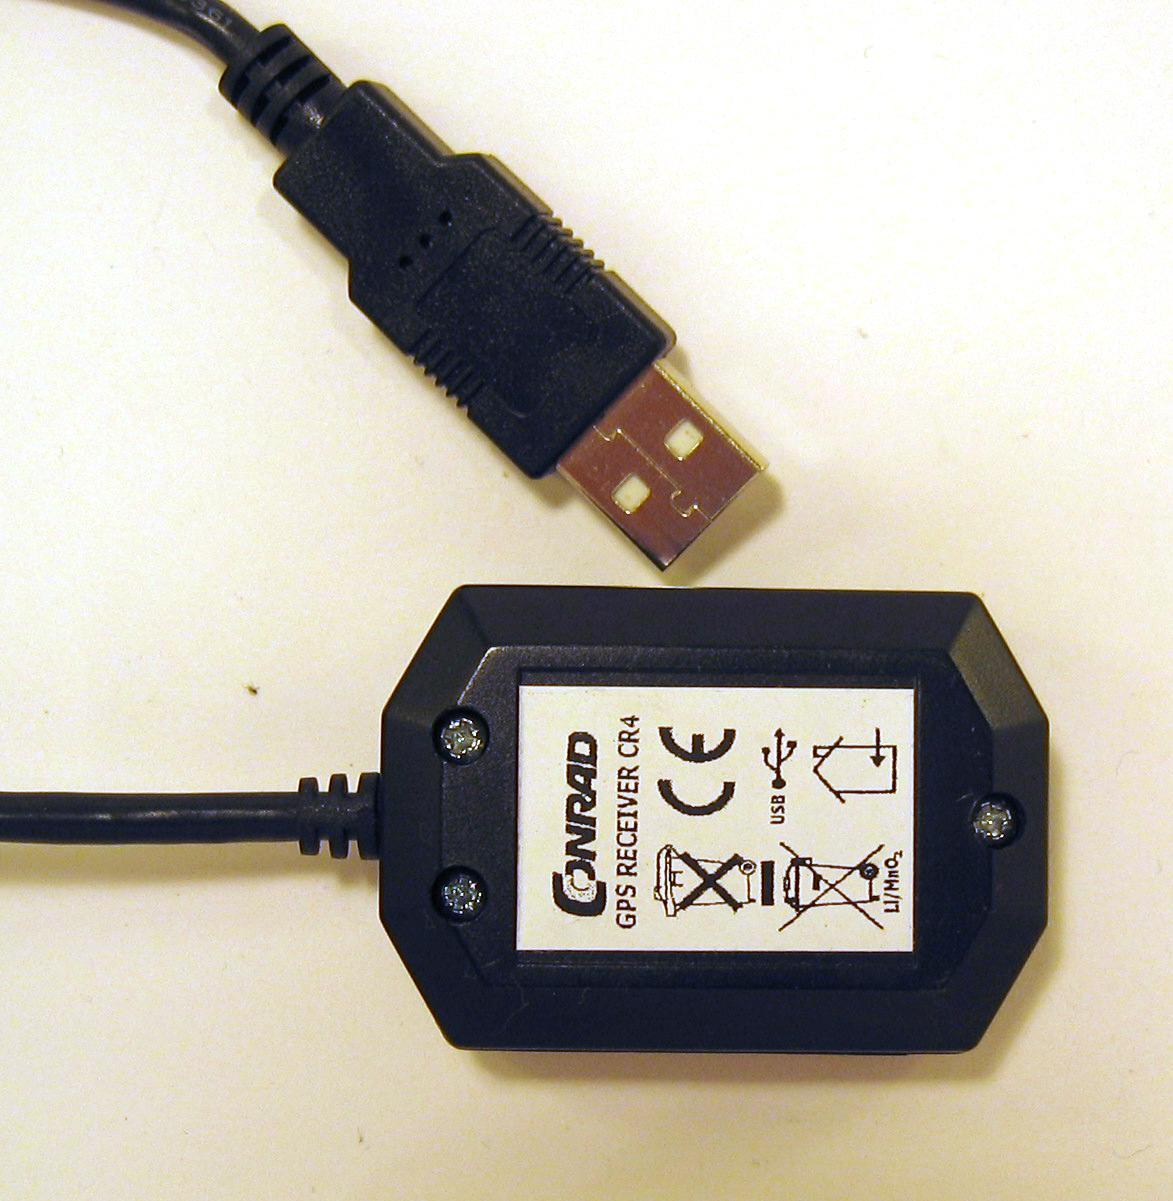 Gps receiver software download